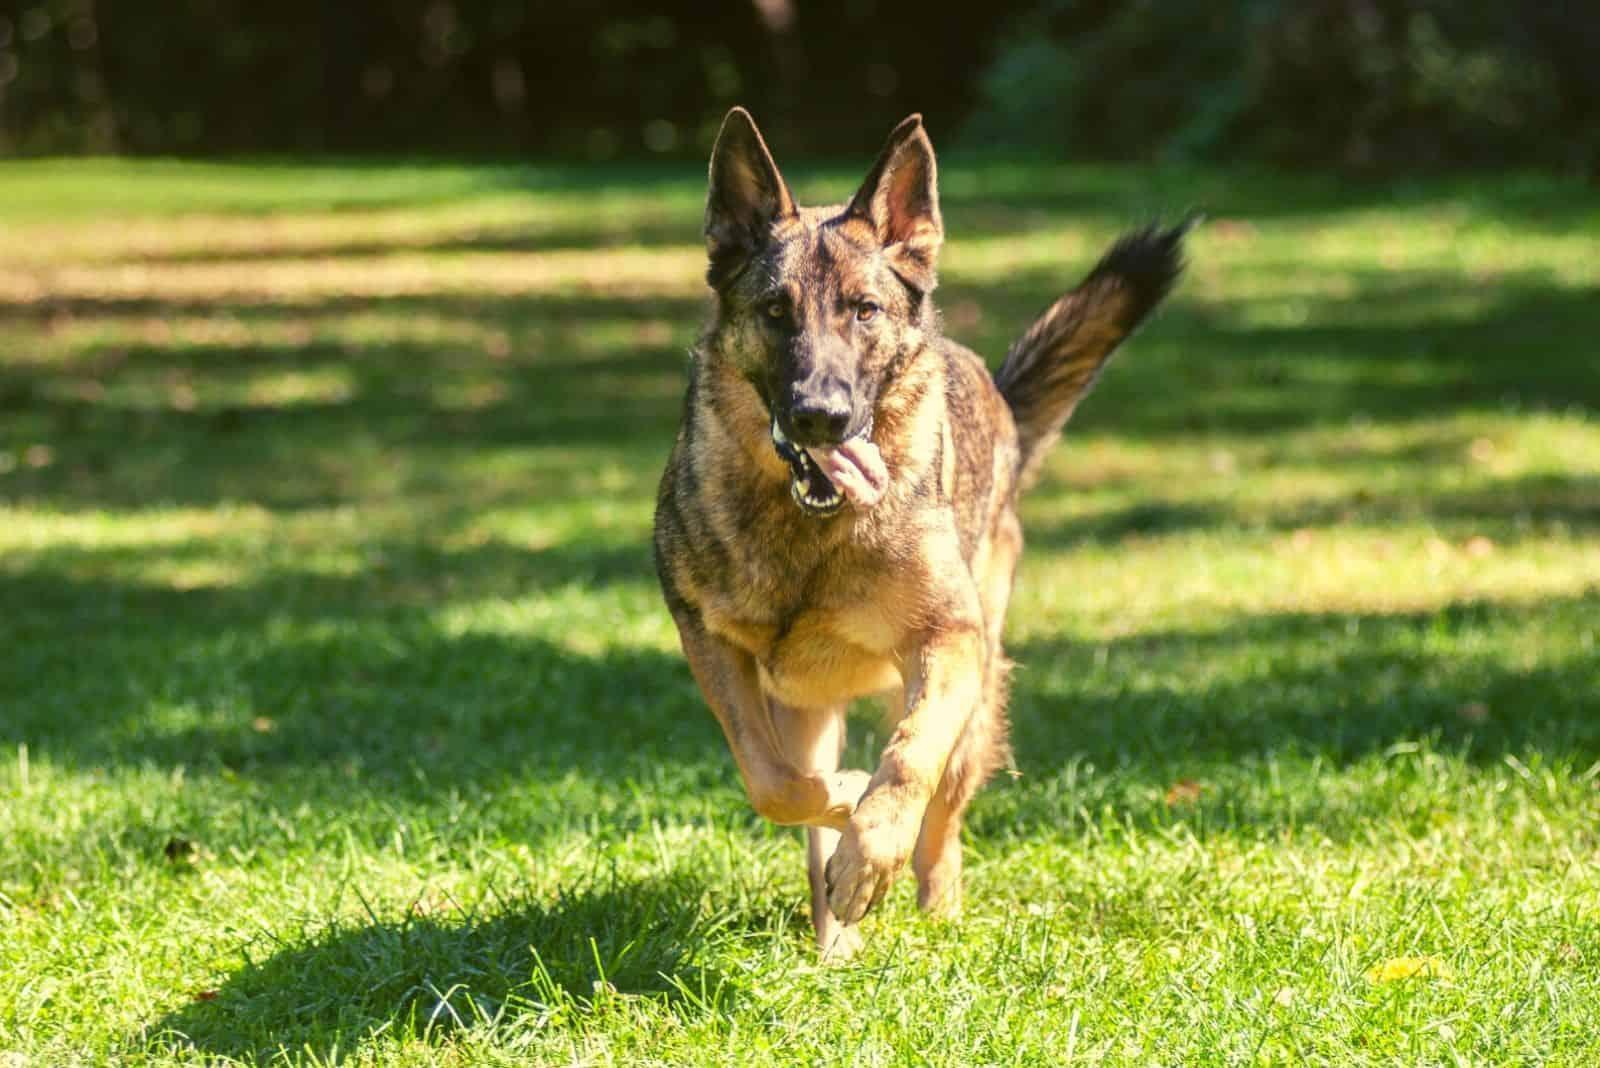 Sable German Shepherd dog running in the park